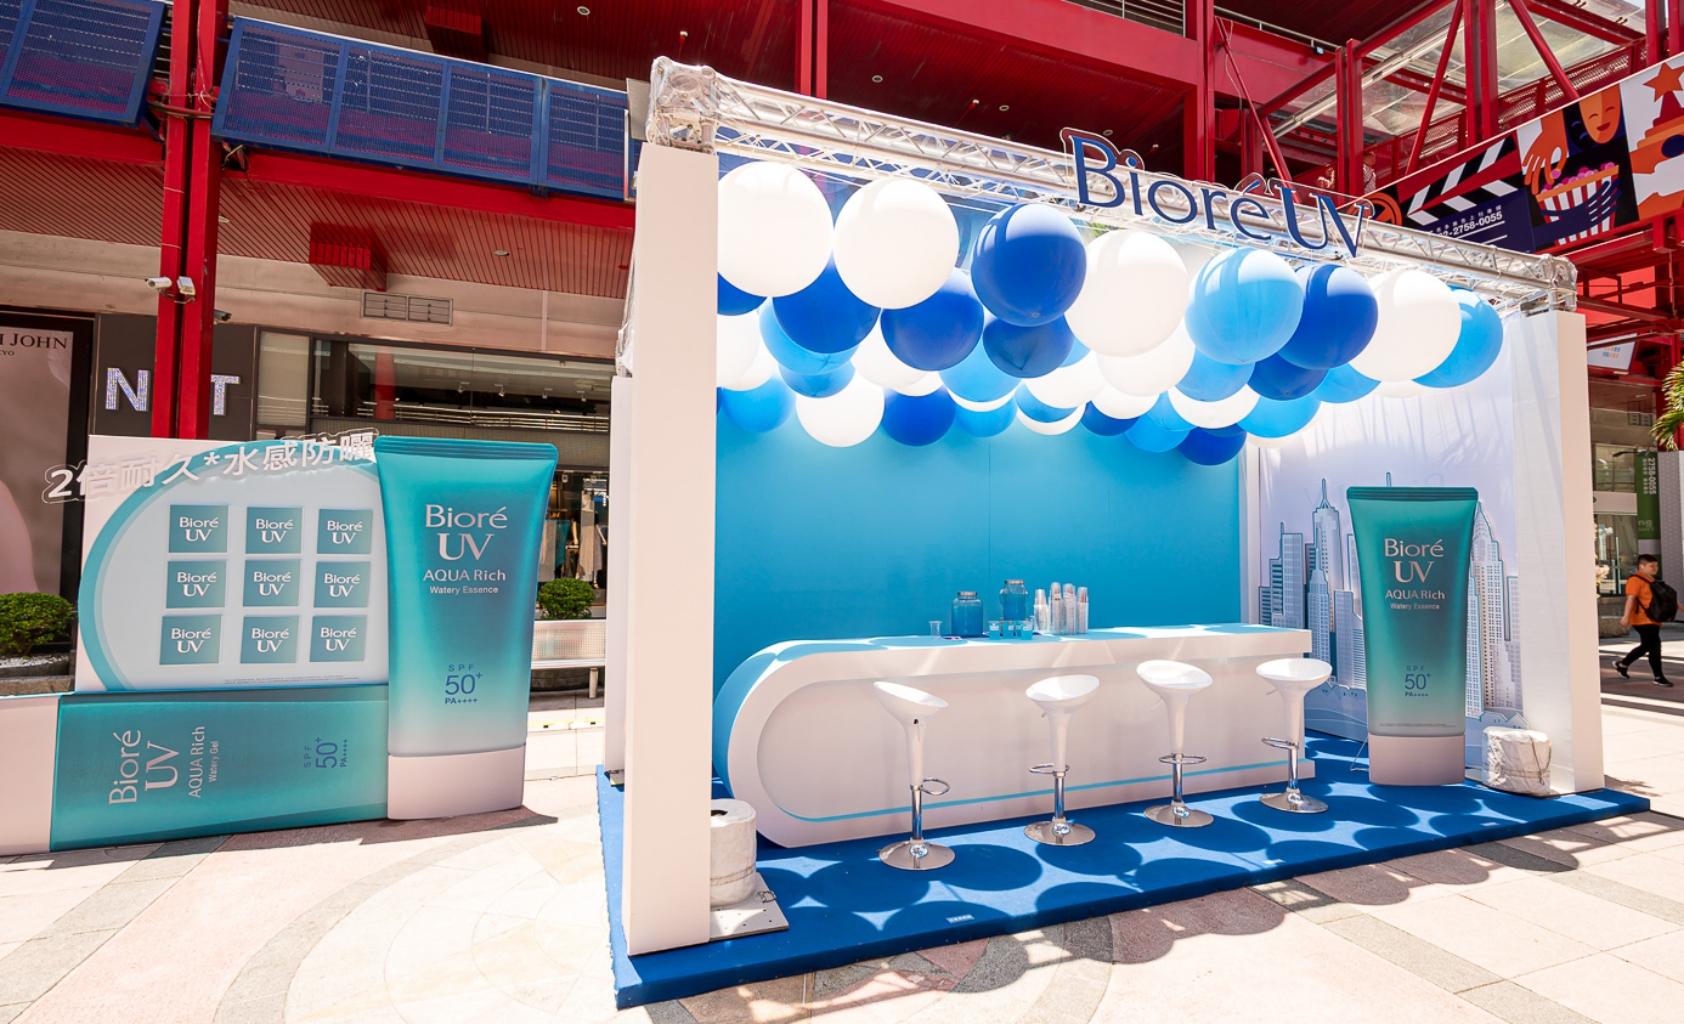 Bioré Uv首度於信義威秀廣場打造抗曬基地2.0